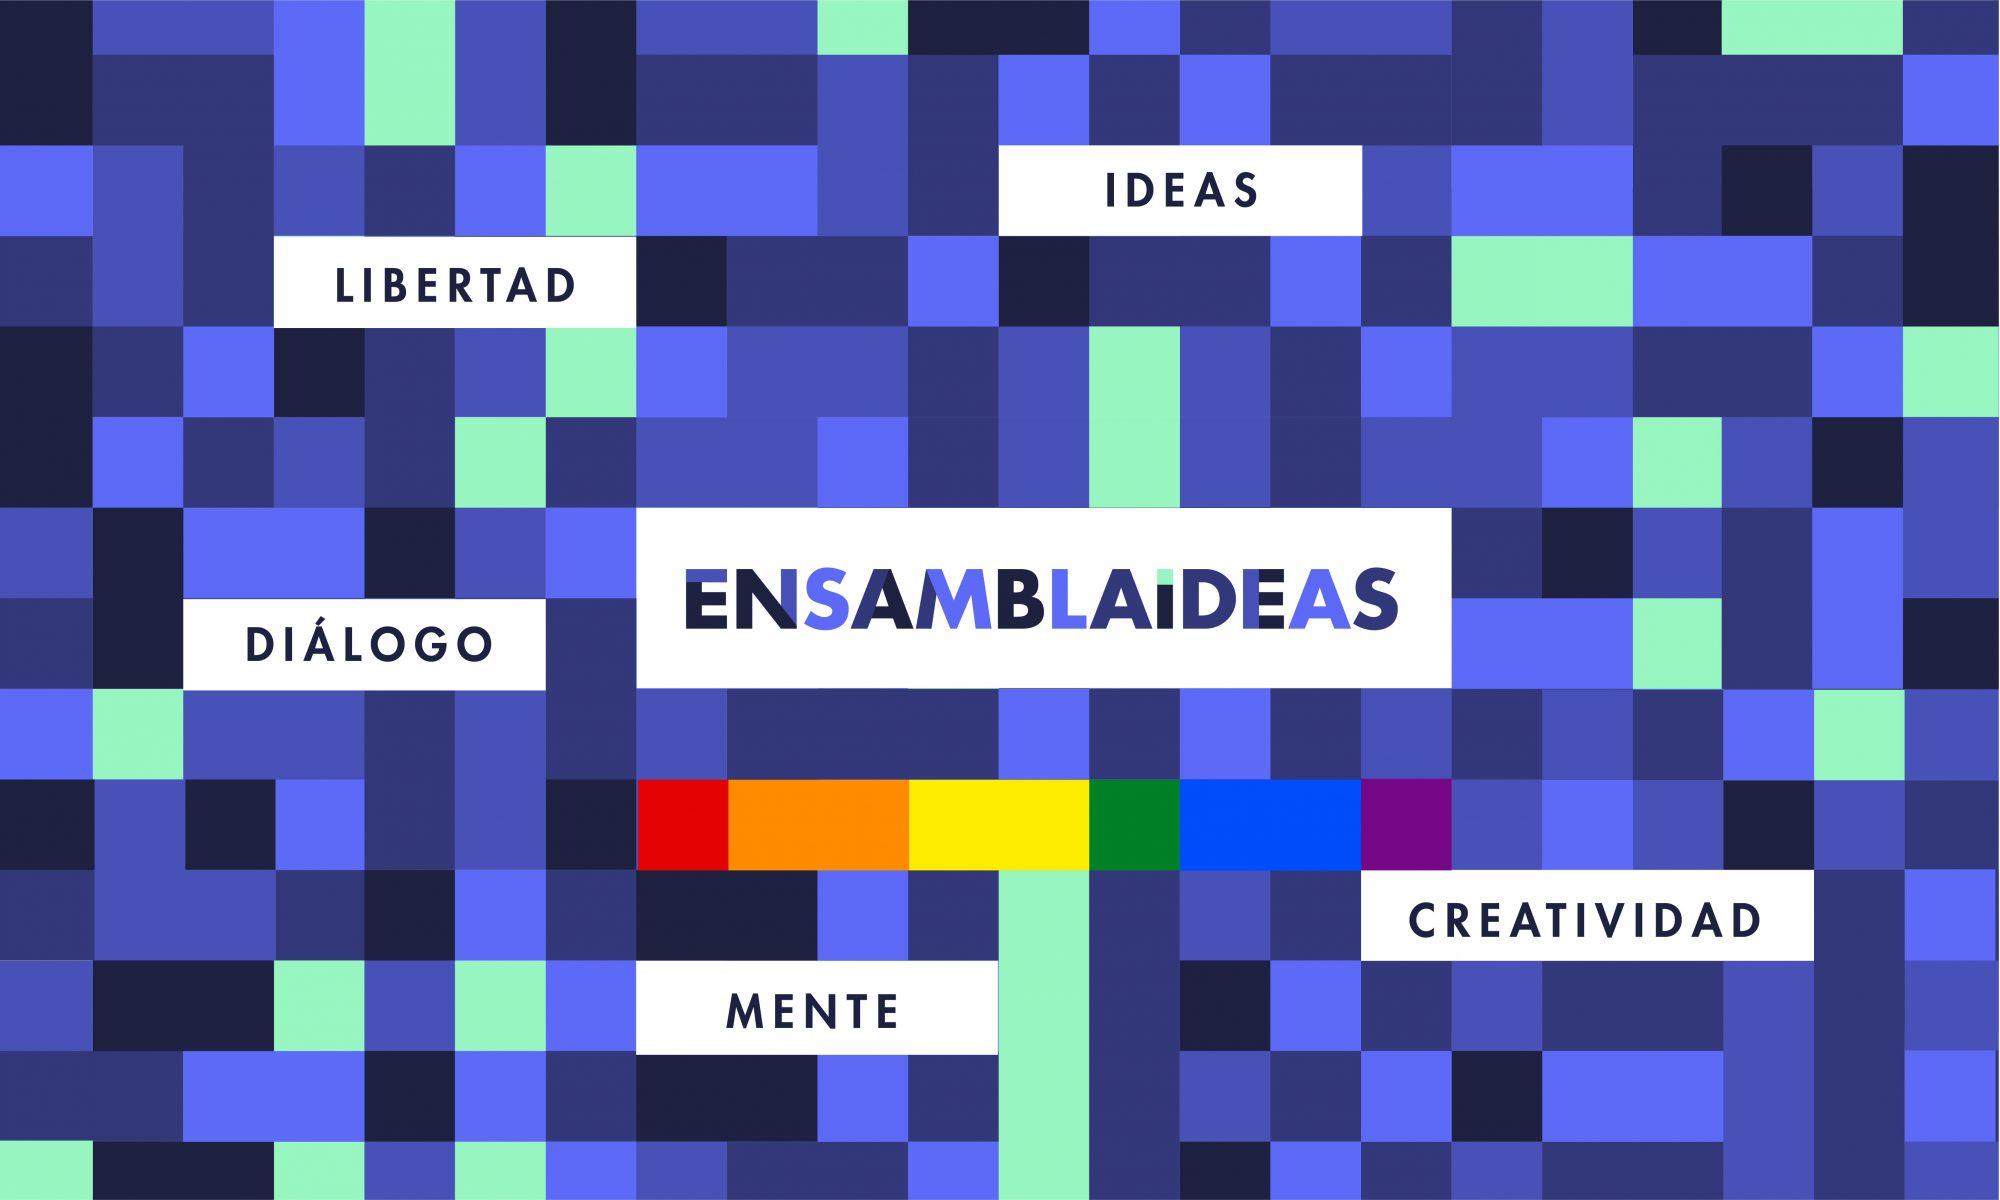 Ensamblaideas